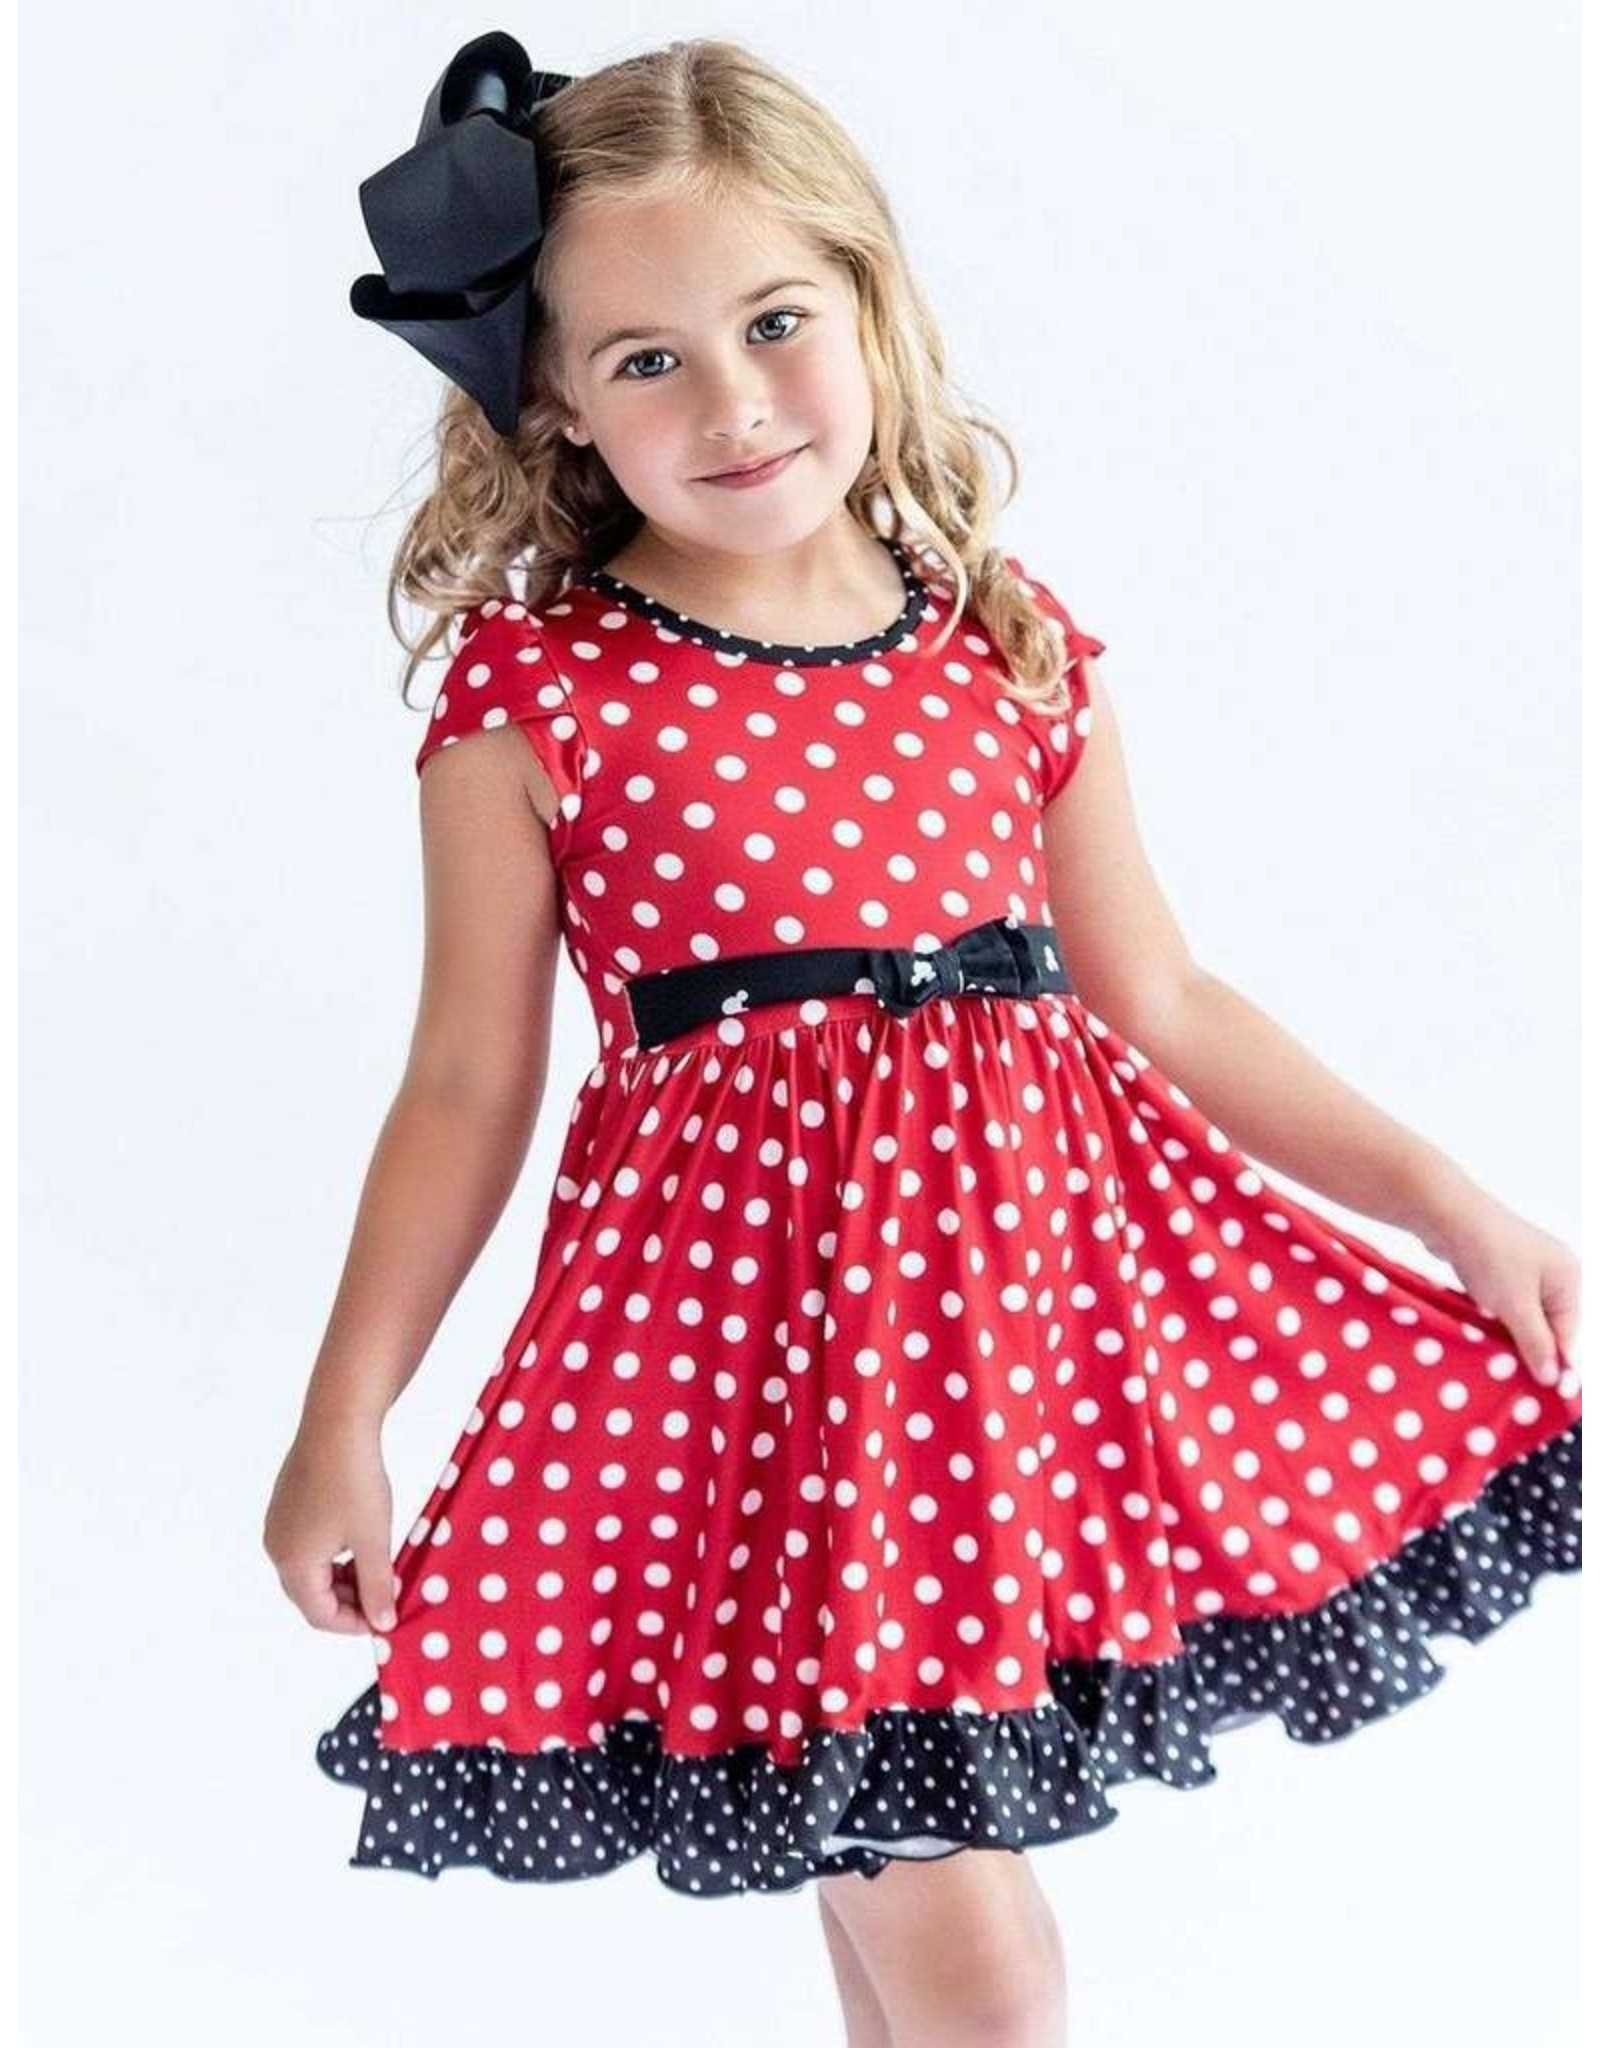 Charlies Project Charlie's Project- Mini Polka Dot Hugs Collection Dress